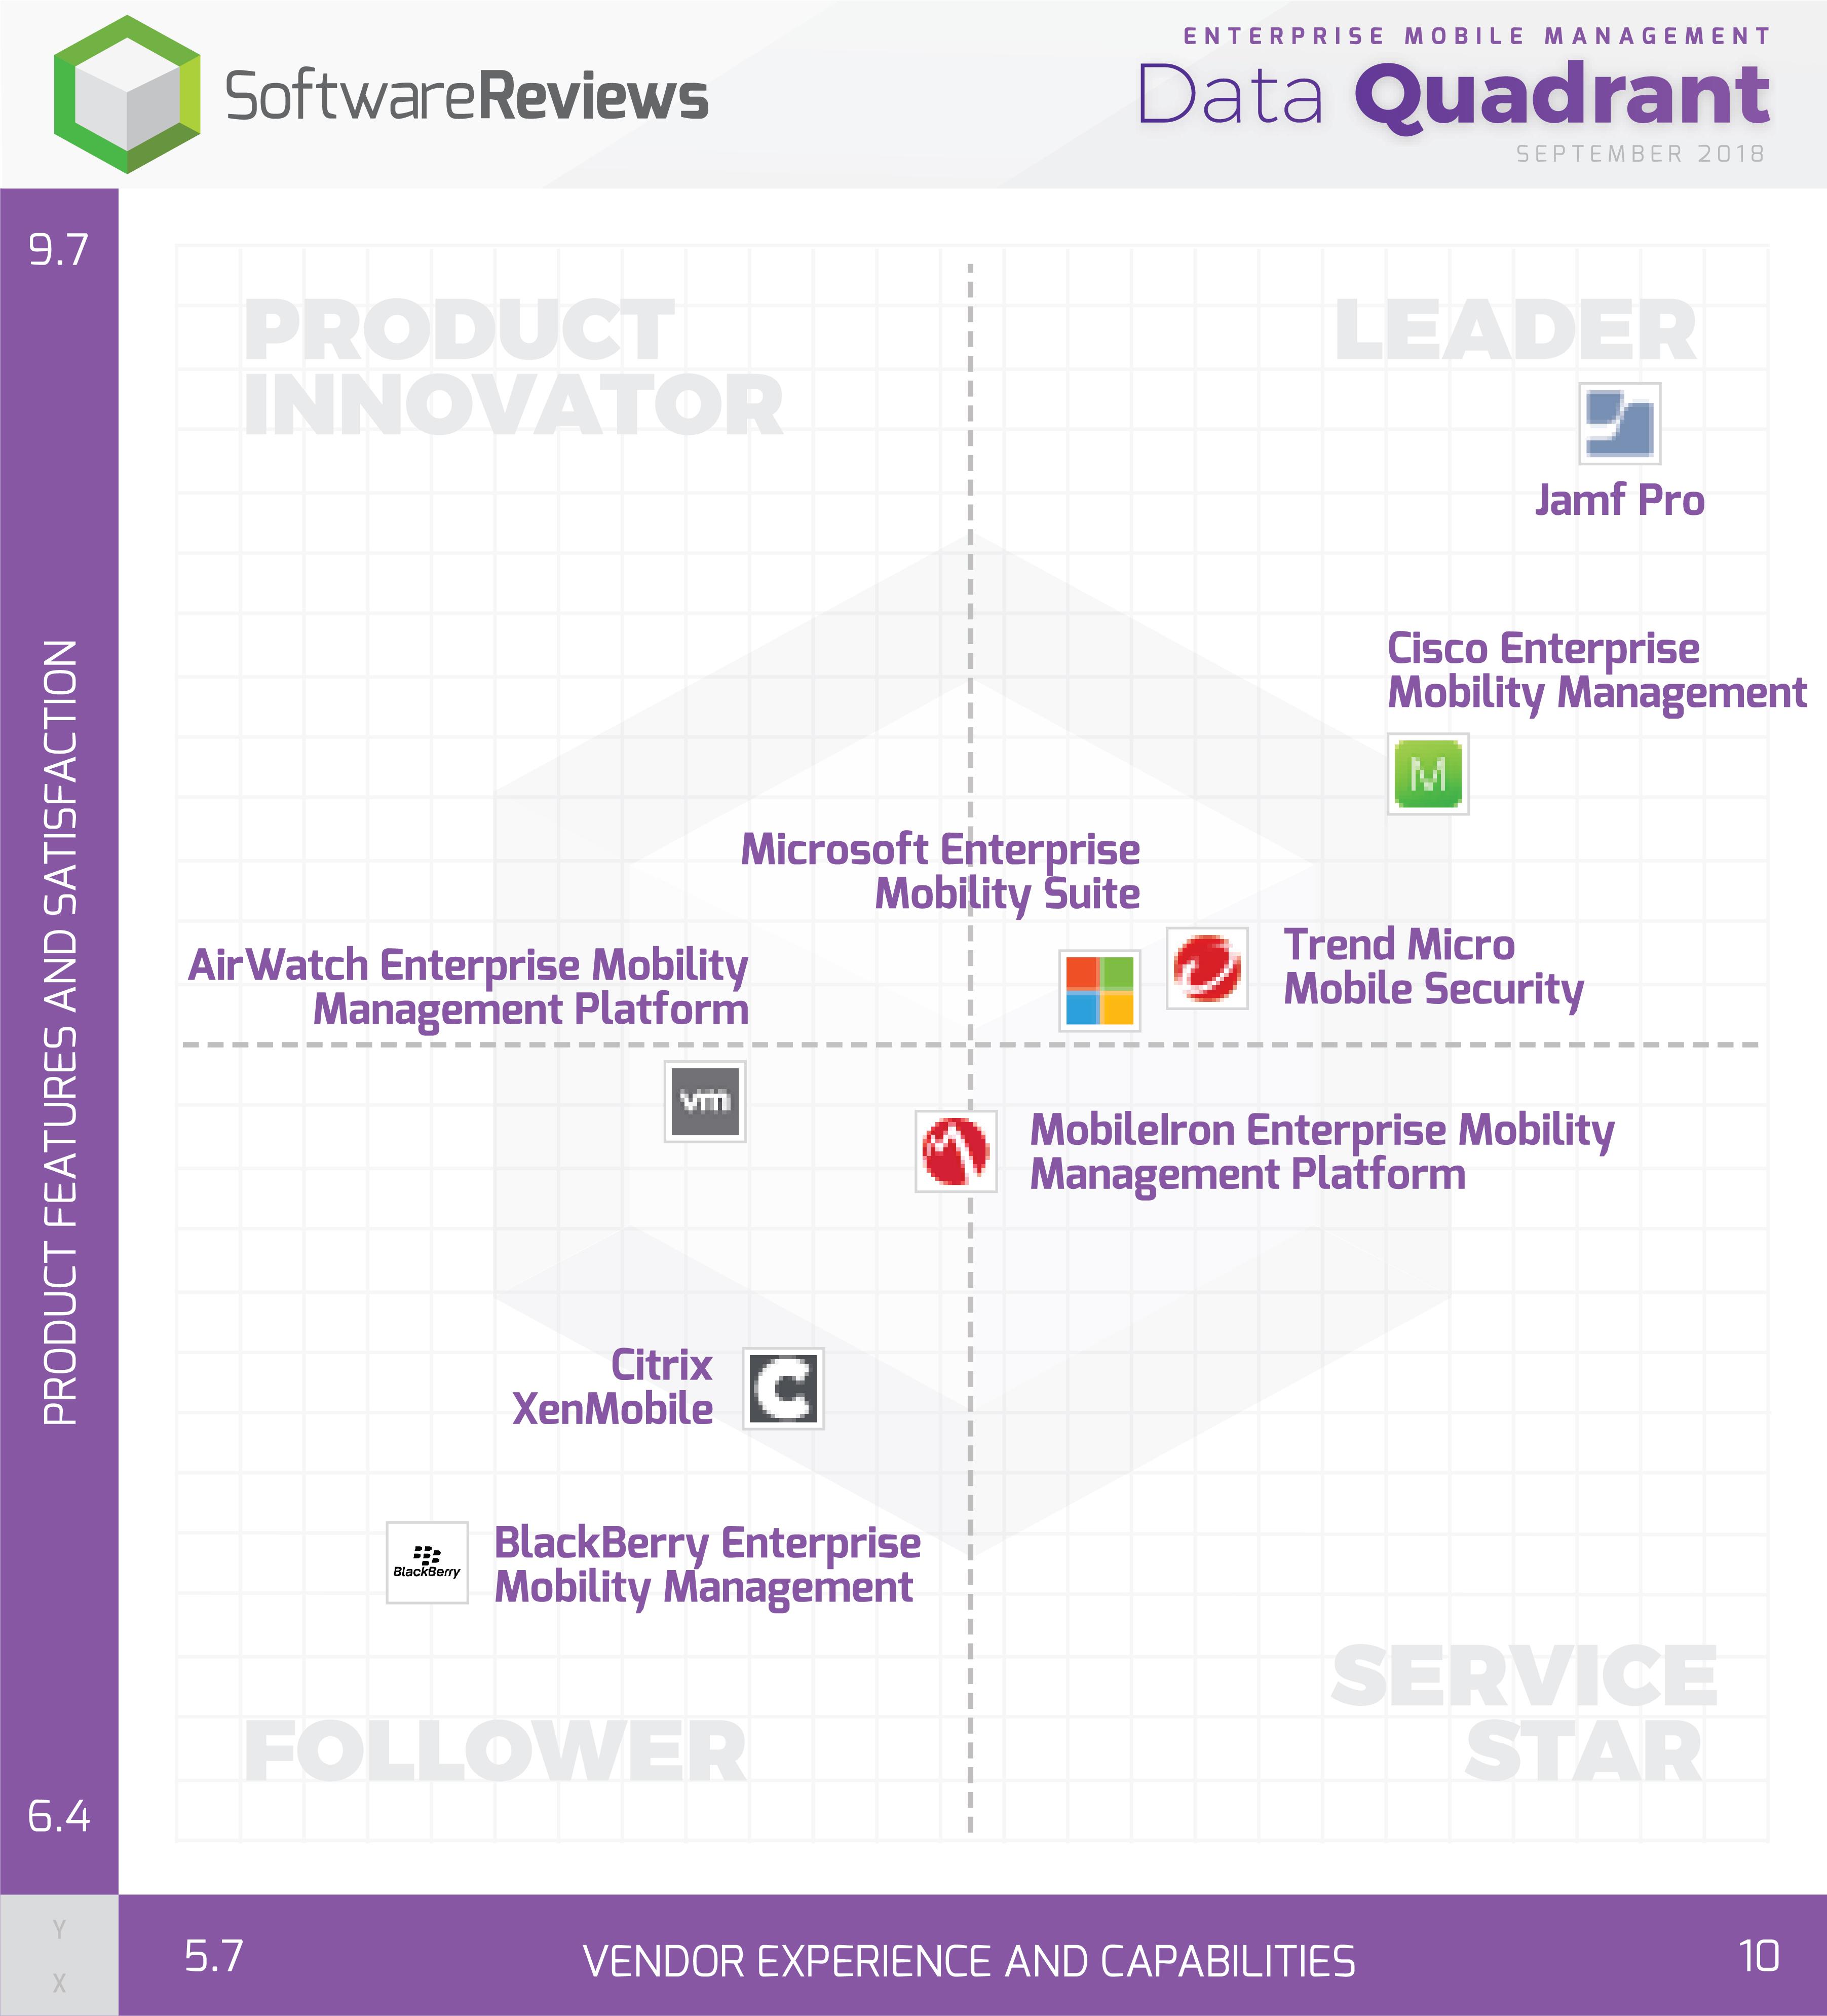 Enterprise Mobile Management Data Quadrant